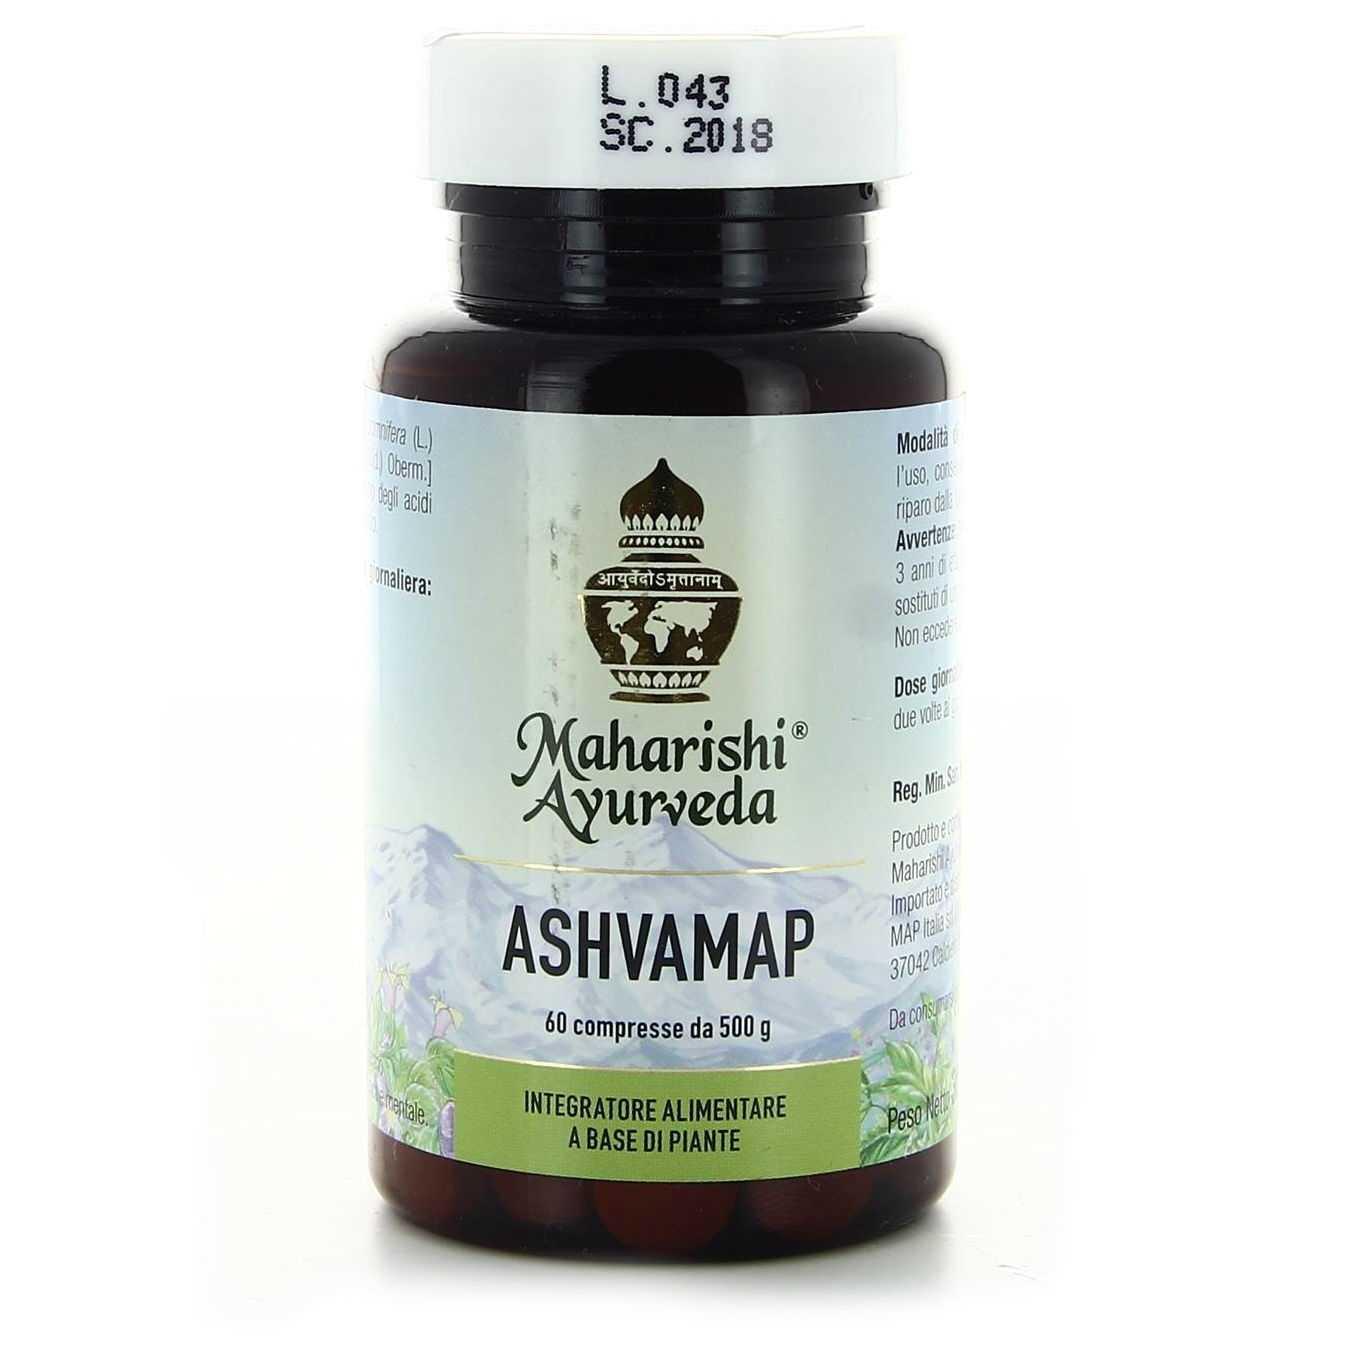 Maharishi Ayurveda - Ashvamap - 60 compresse